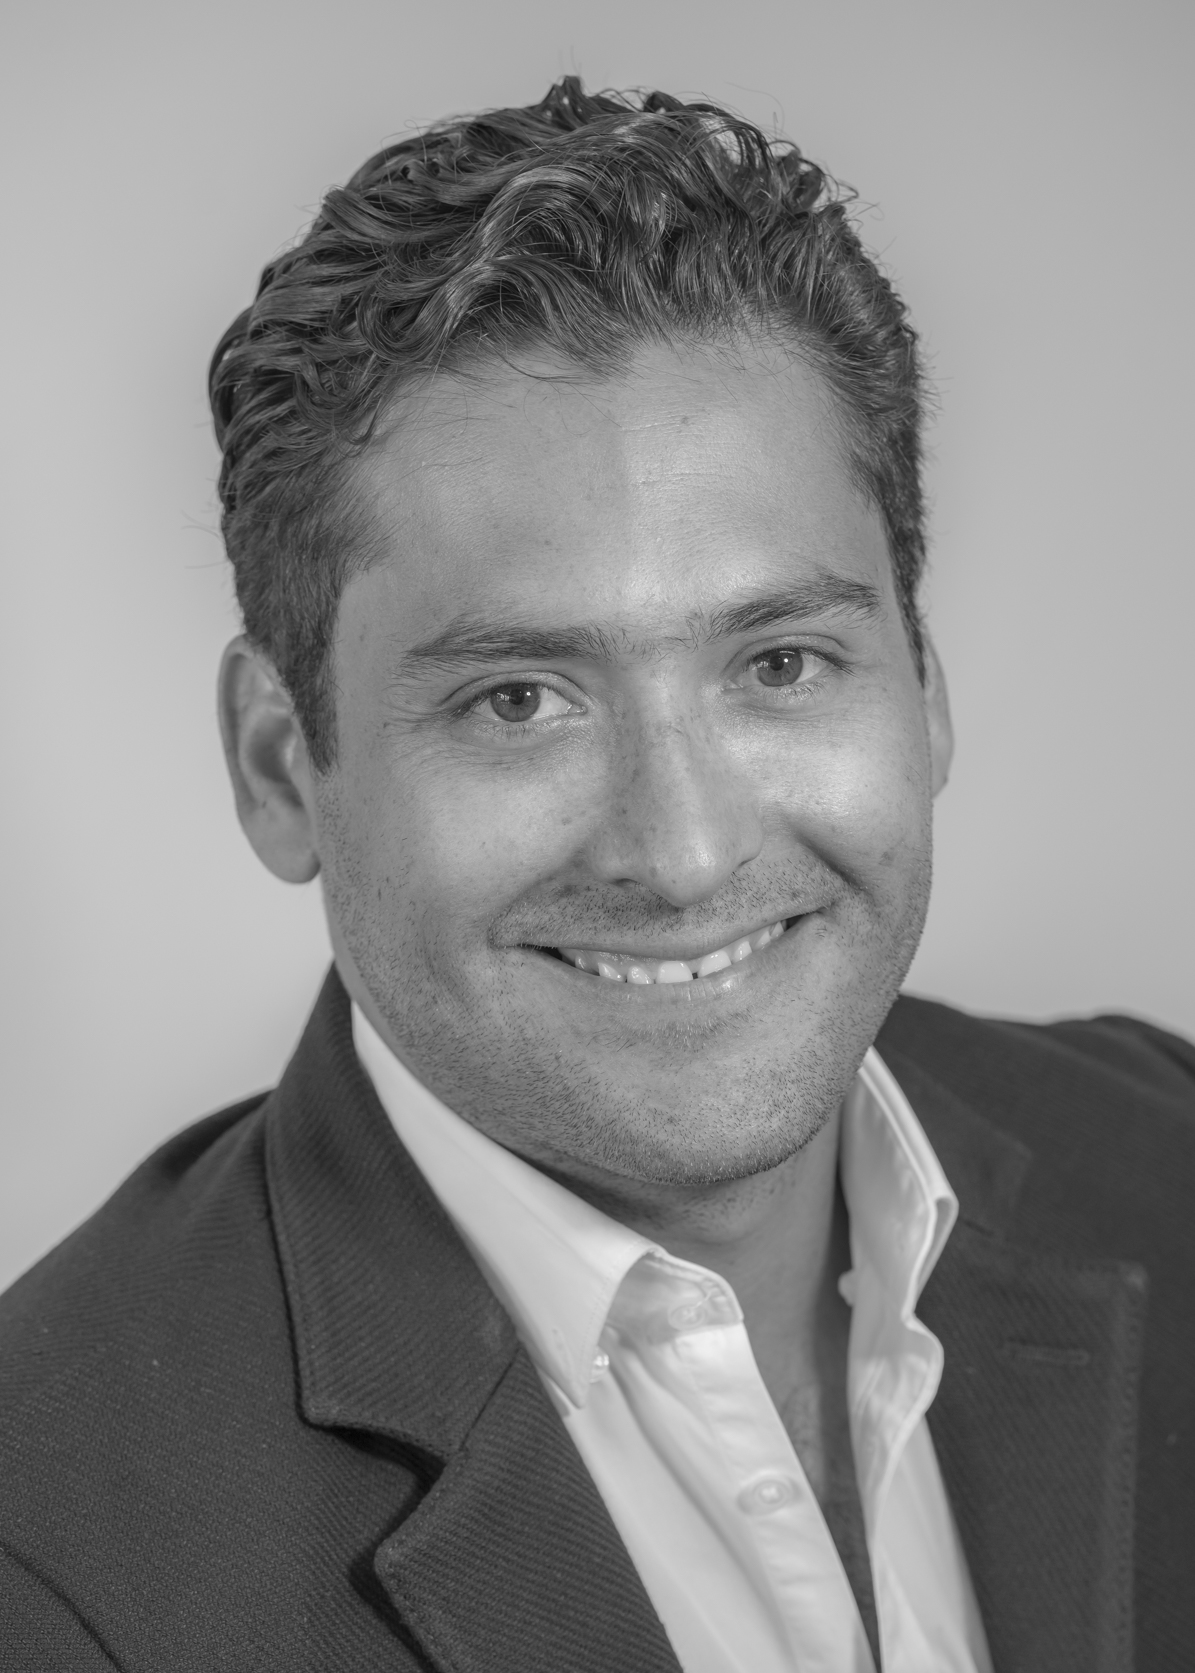 Fernando Guzmán